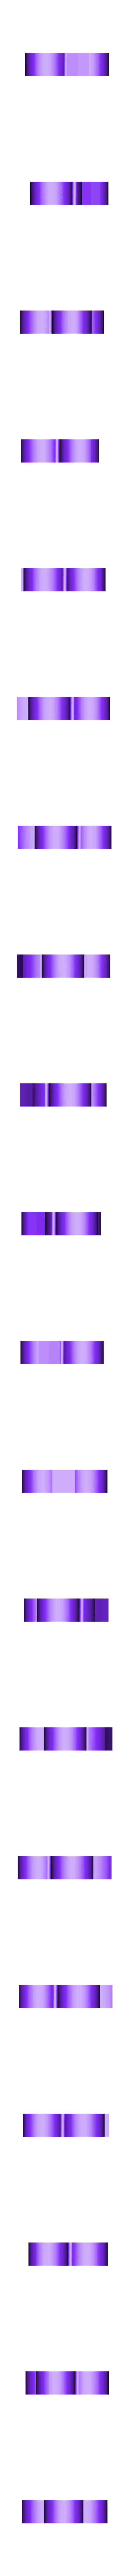 Club.stl Download free STL file Cards Cookie Cutters (4 Pack) • 3D print design, Jdog